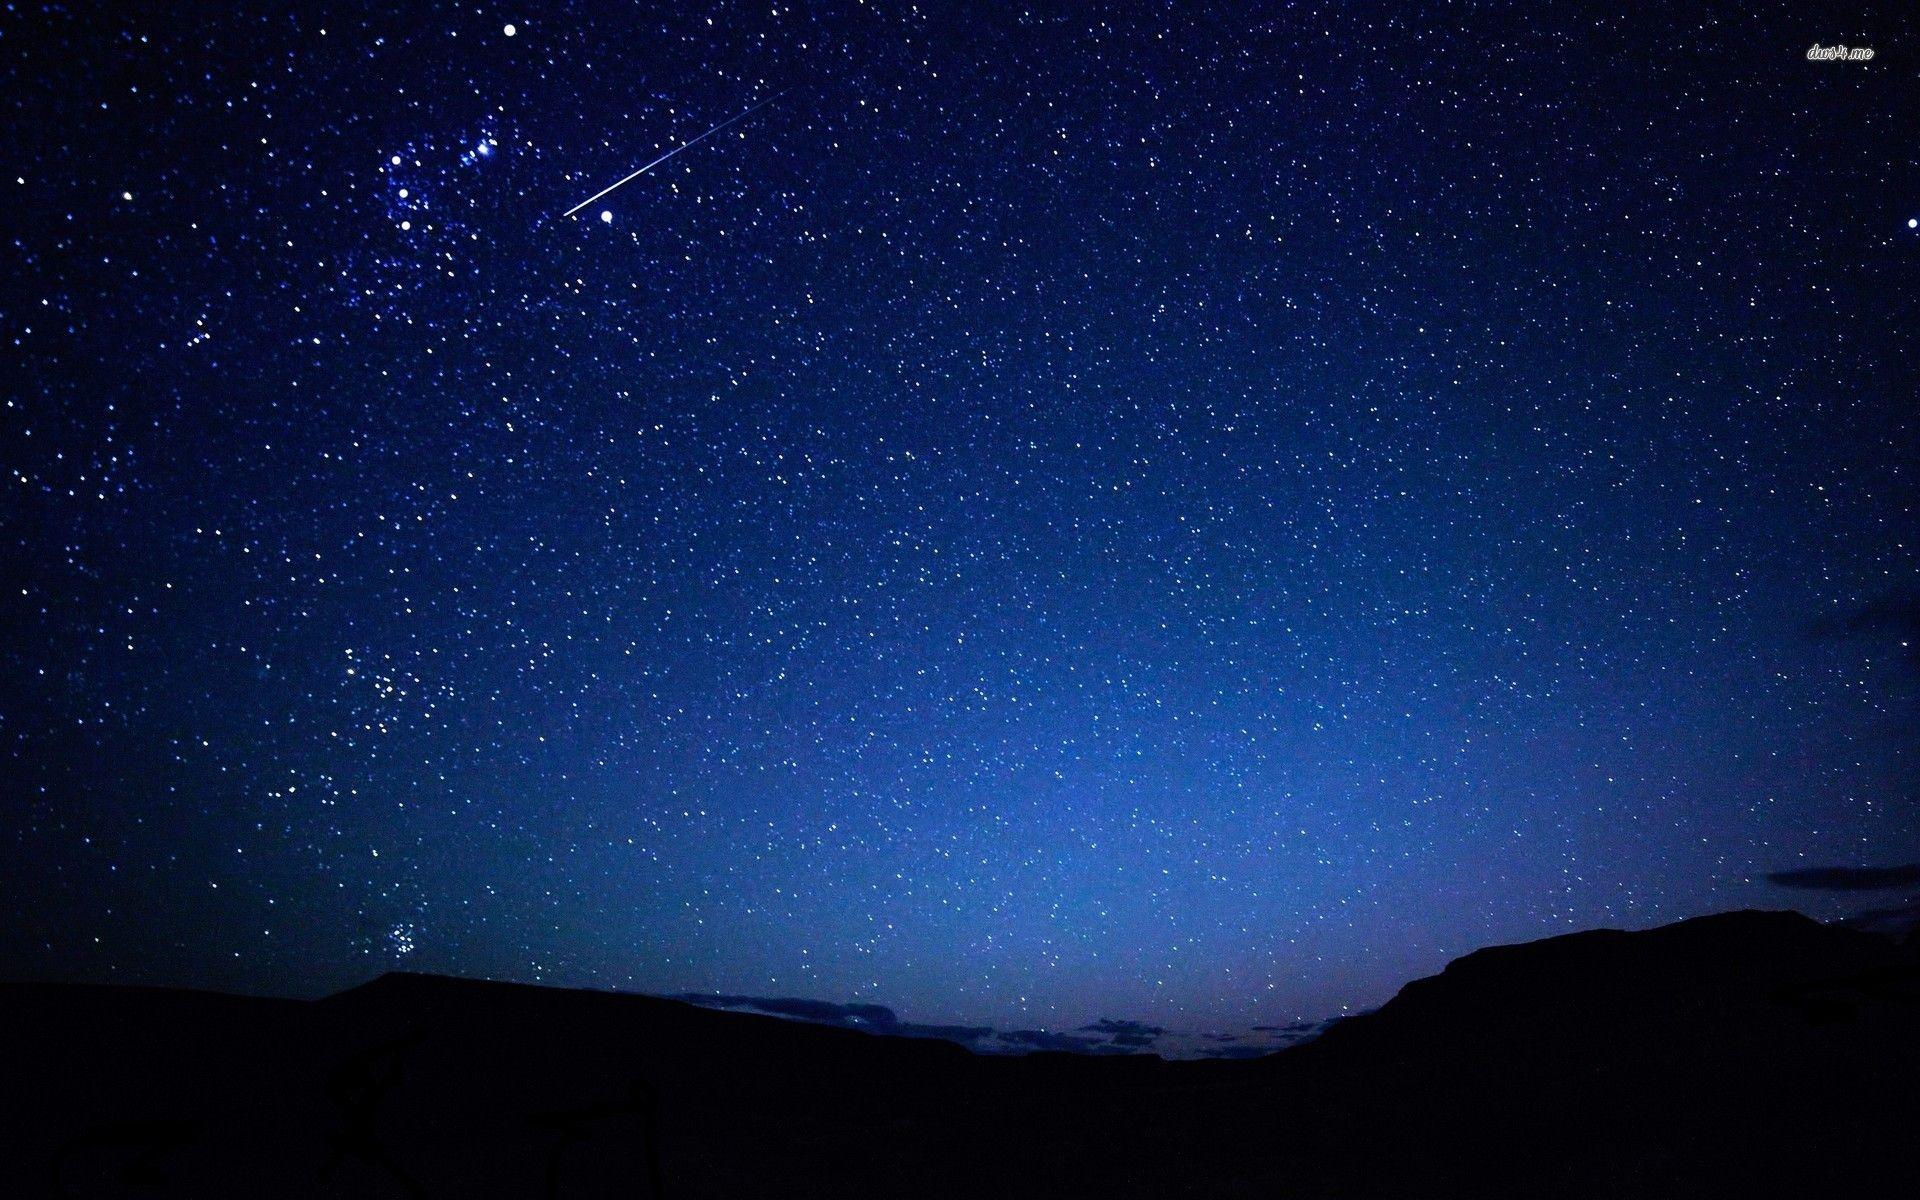 Stars In The Sky Hd Wallpaper Night Sky Wallpaper Star Sky Starry Night Wallpaper